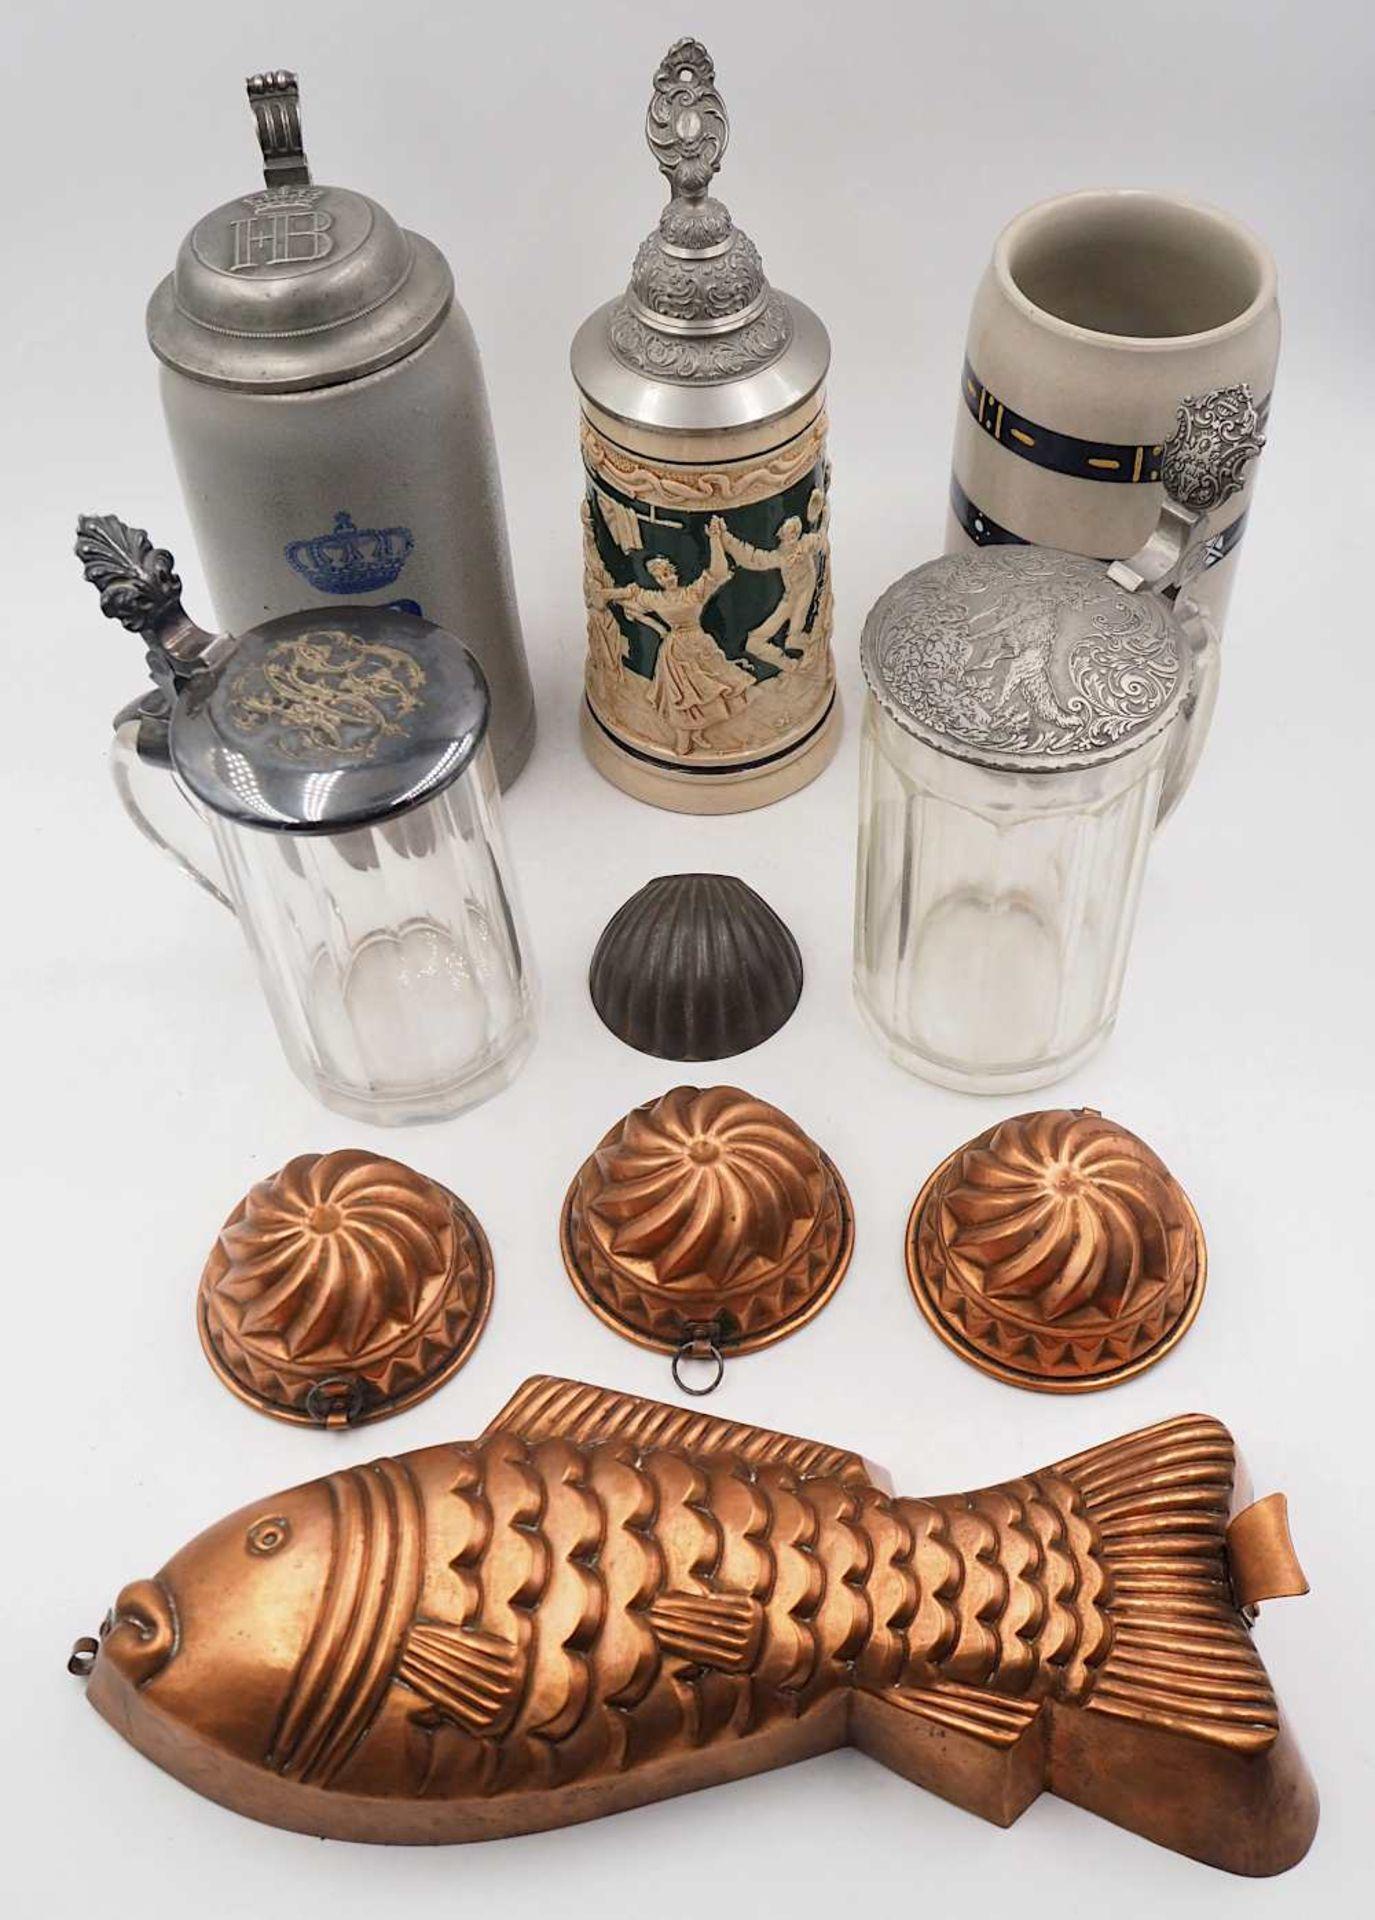 1 Konv. Bierkrüge, z.T. wohl Anfang 20. Jh. Steinzeug/Keramik/Glas, z.T. mit Zinndeck